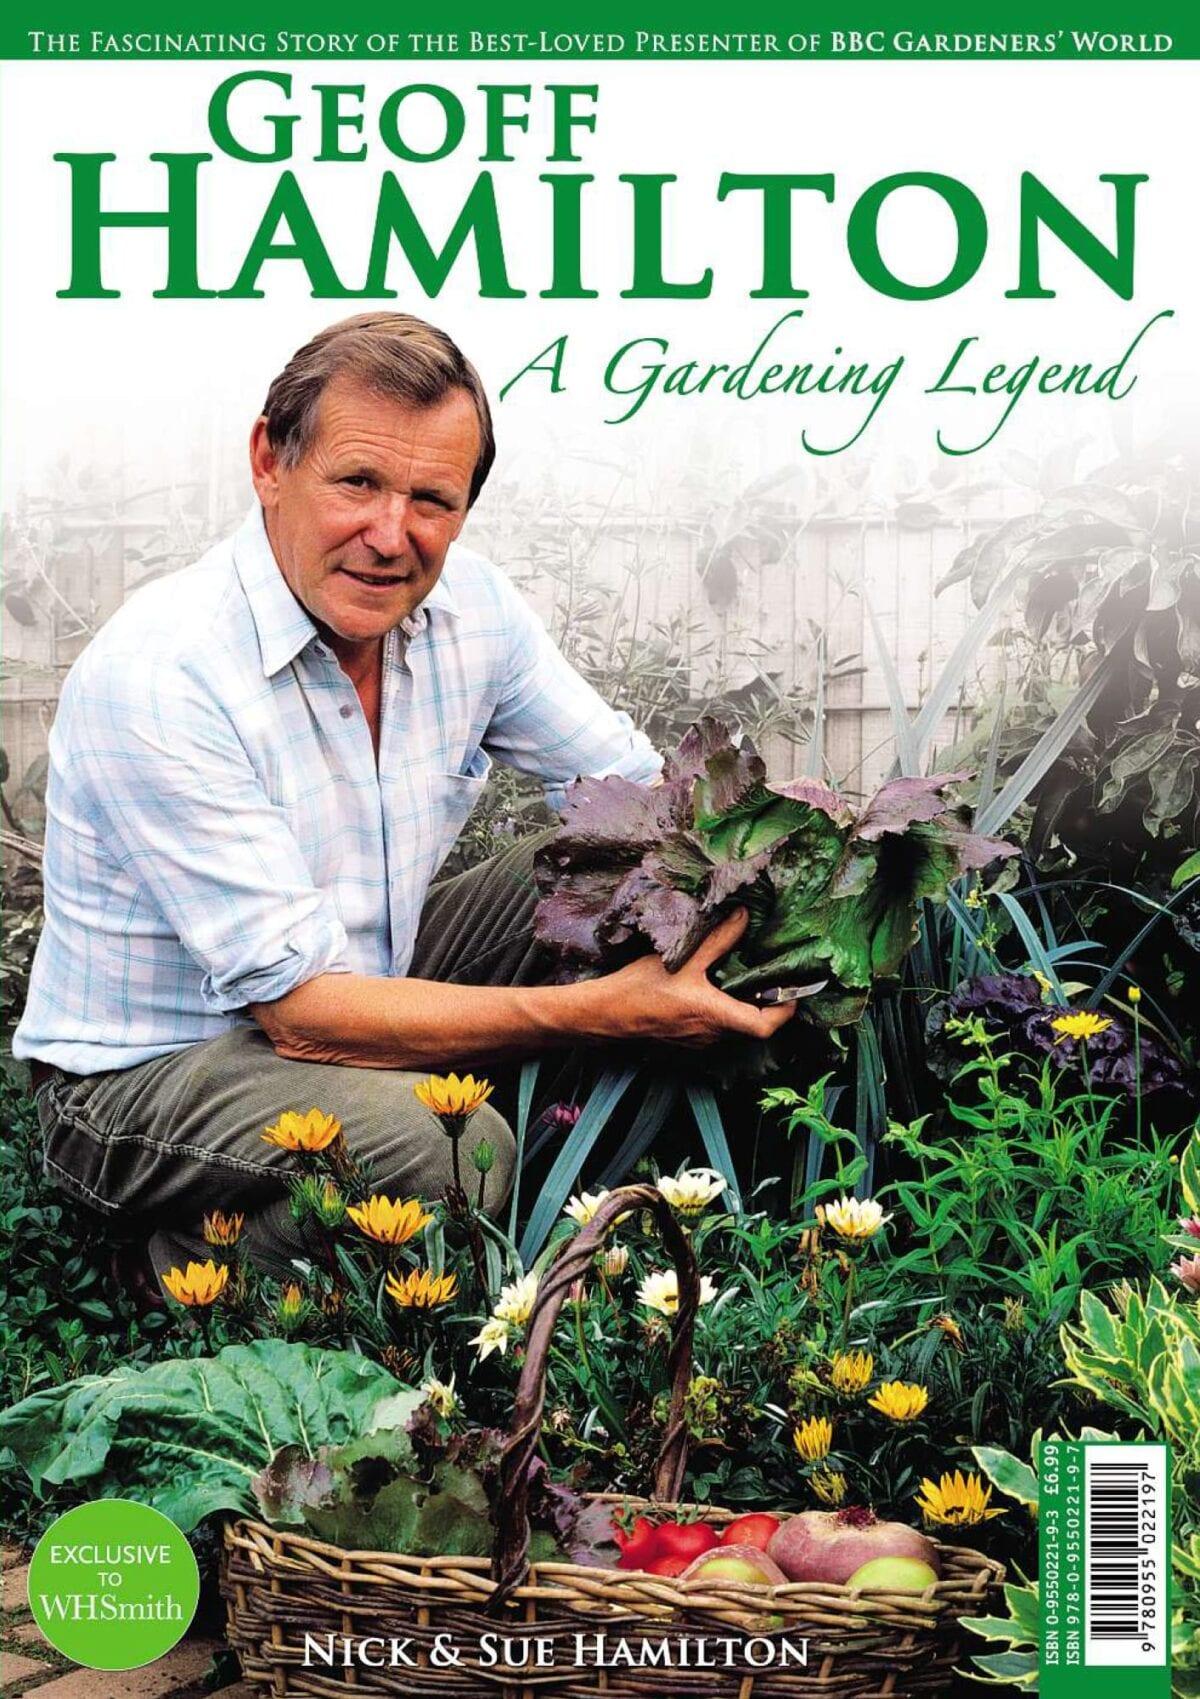 Geoff Hamilton: A Gardening Legend